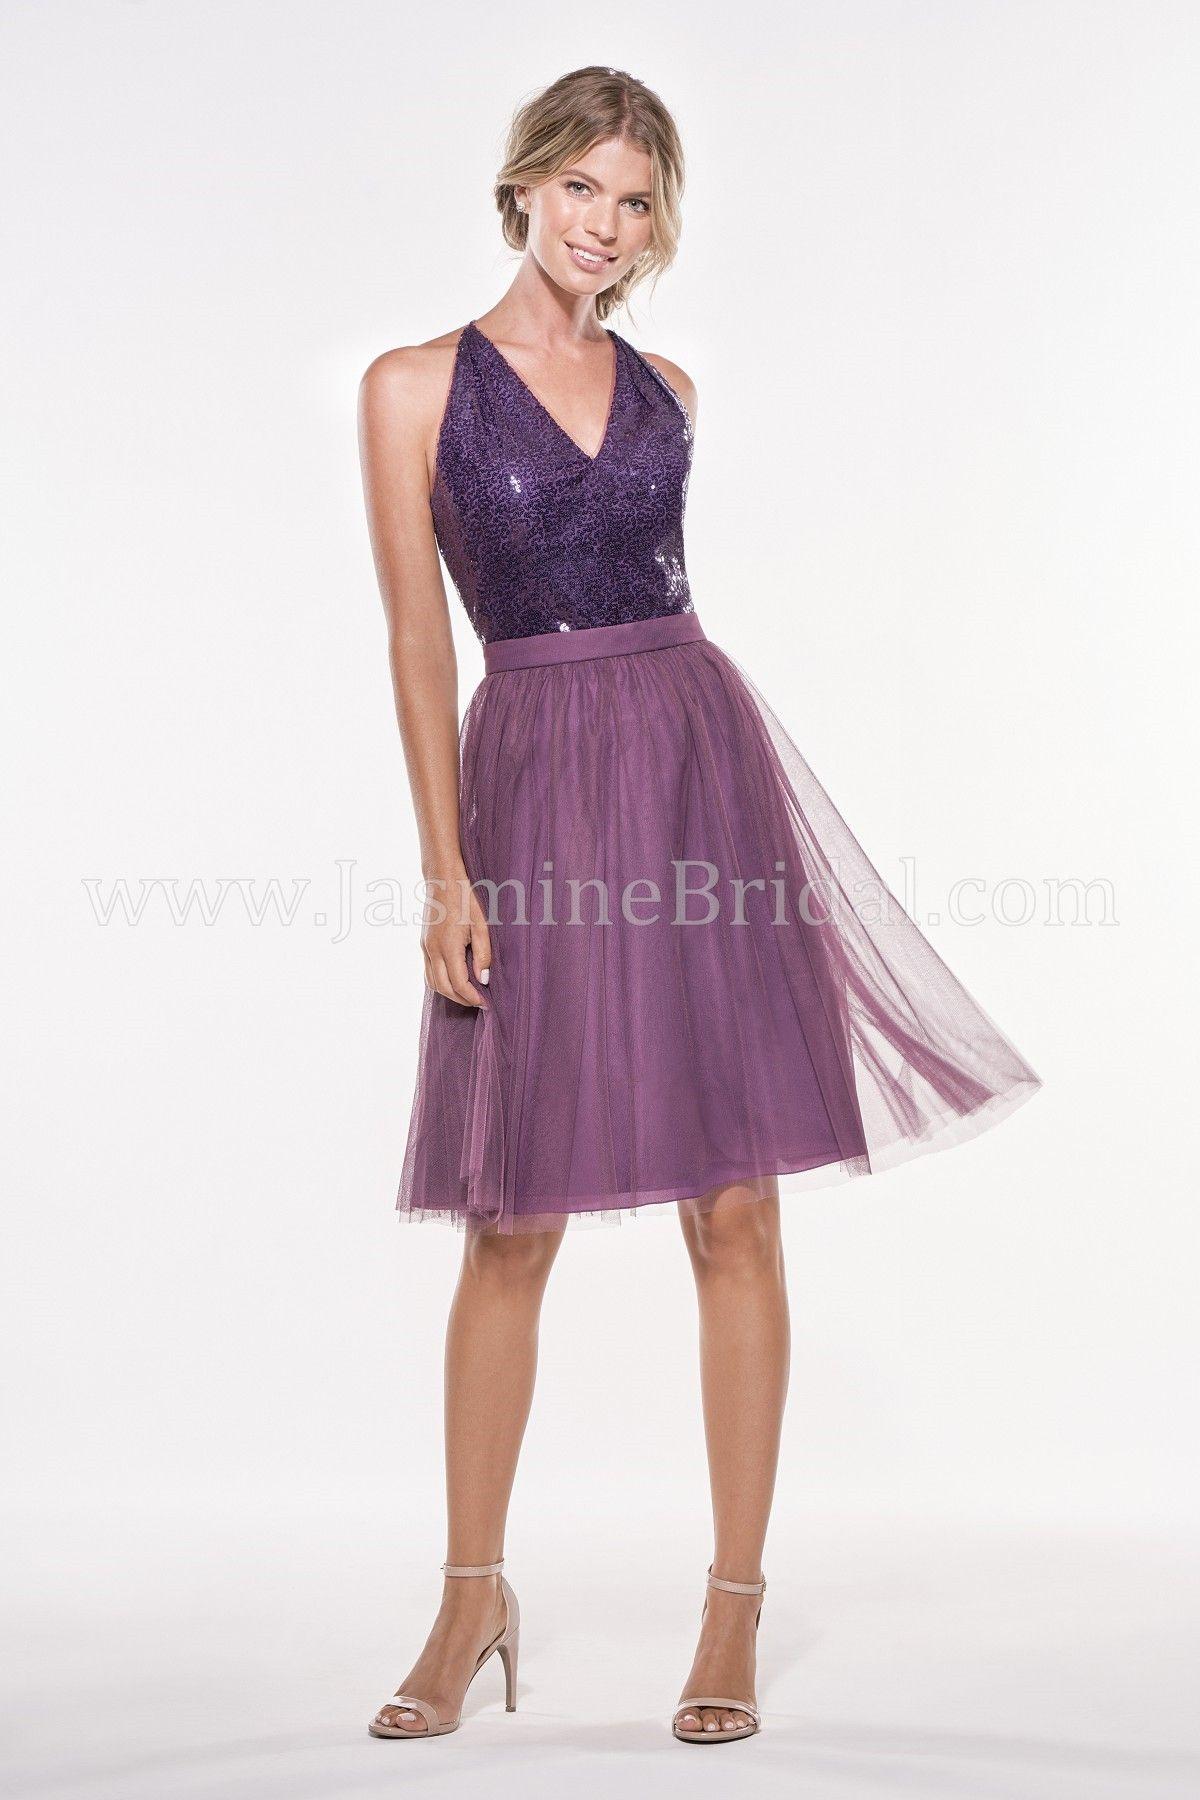 Jasmine Bridal - Jasmine Bridesmaids Style P196013K in Sequin II ...